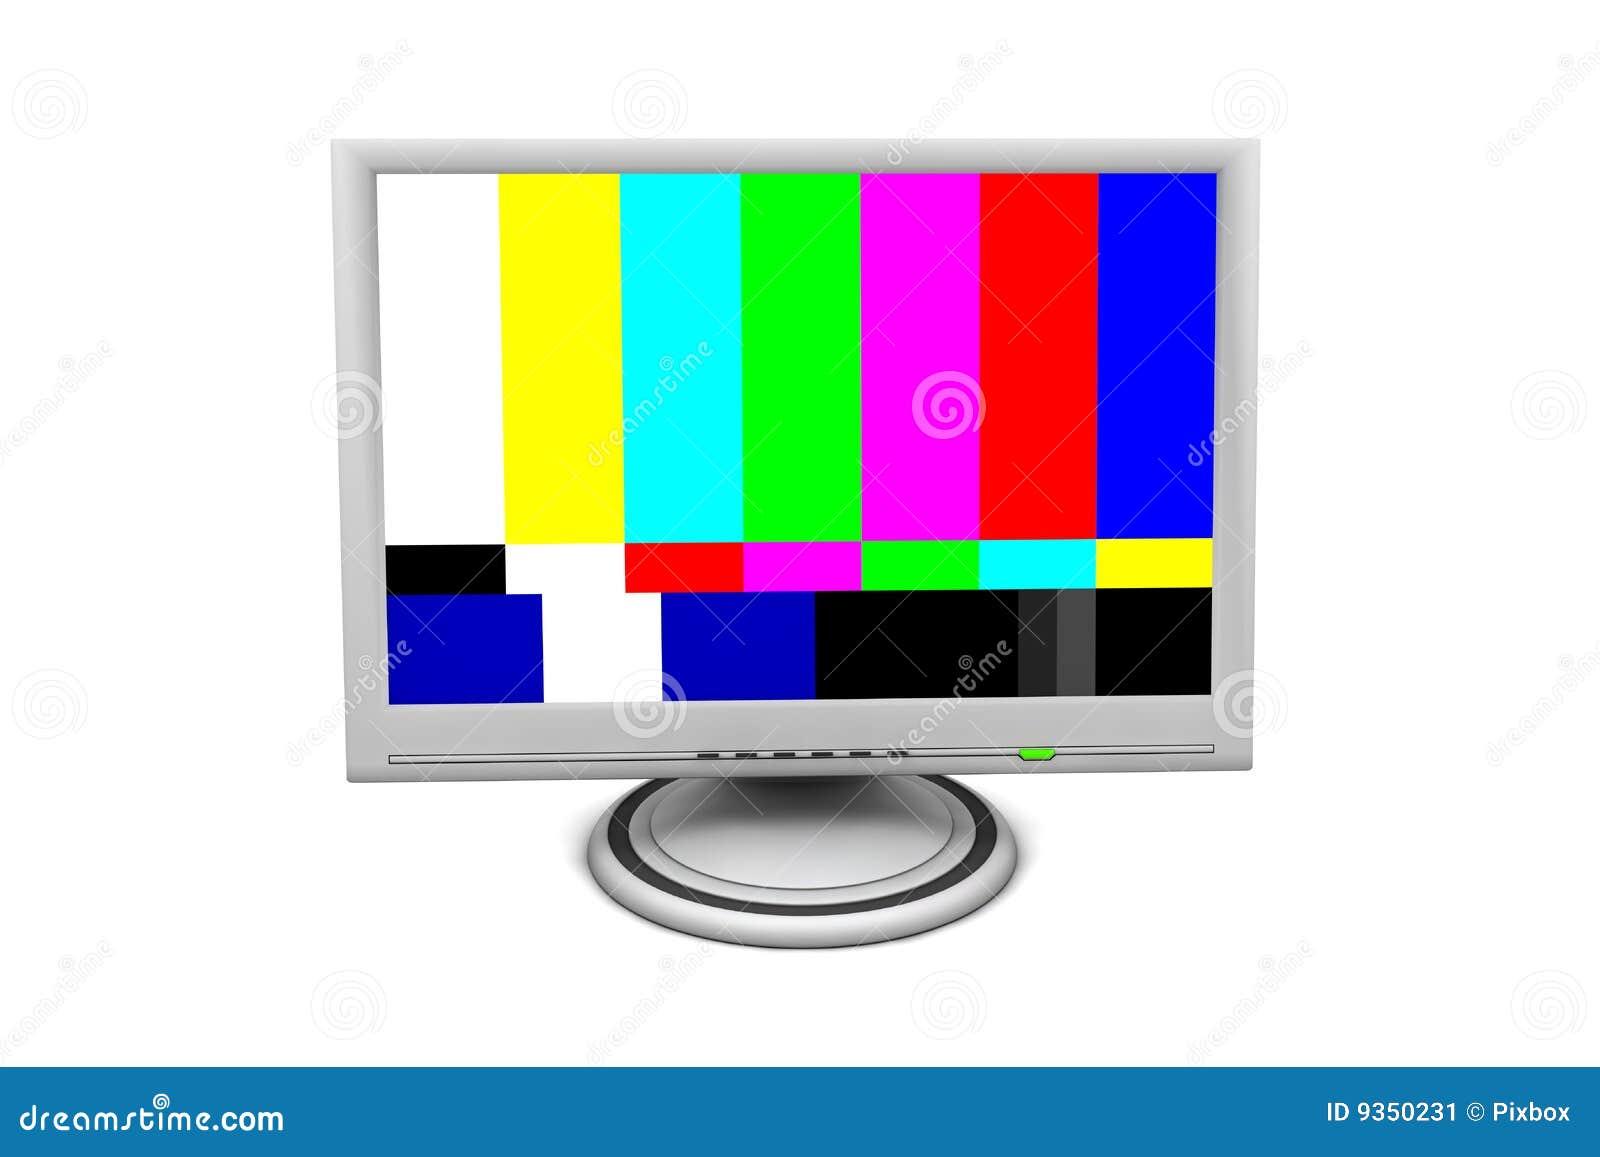 Led Monitor: Lcd Monitor Test